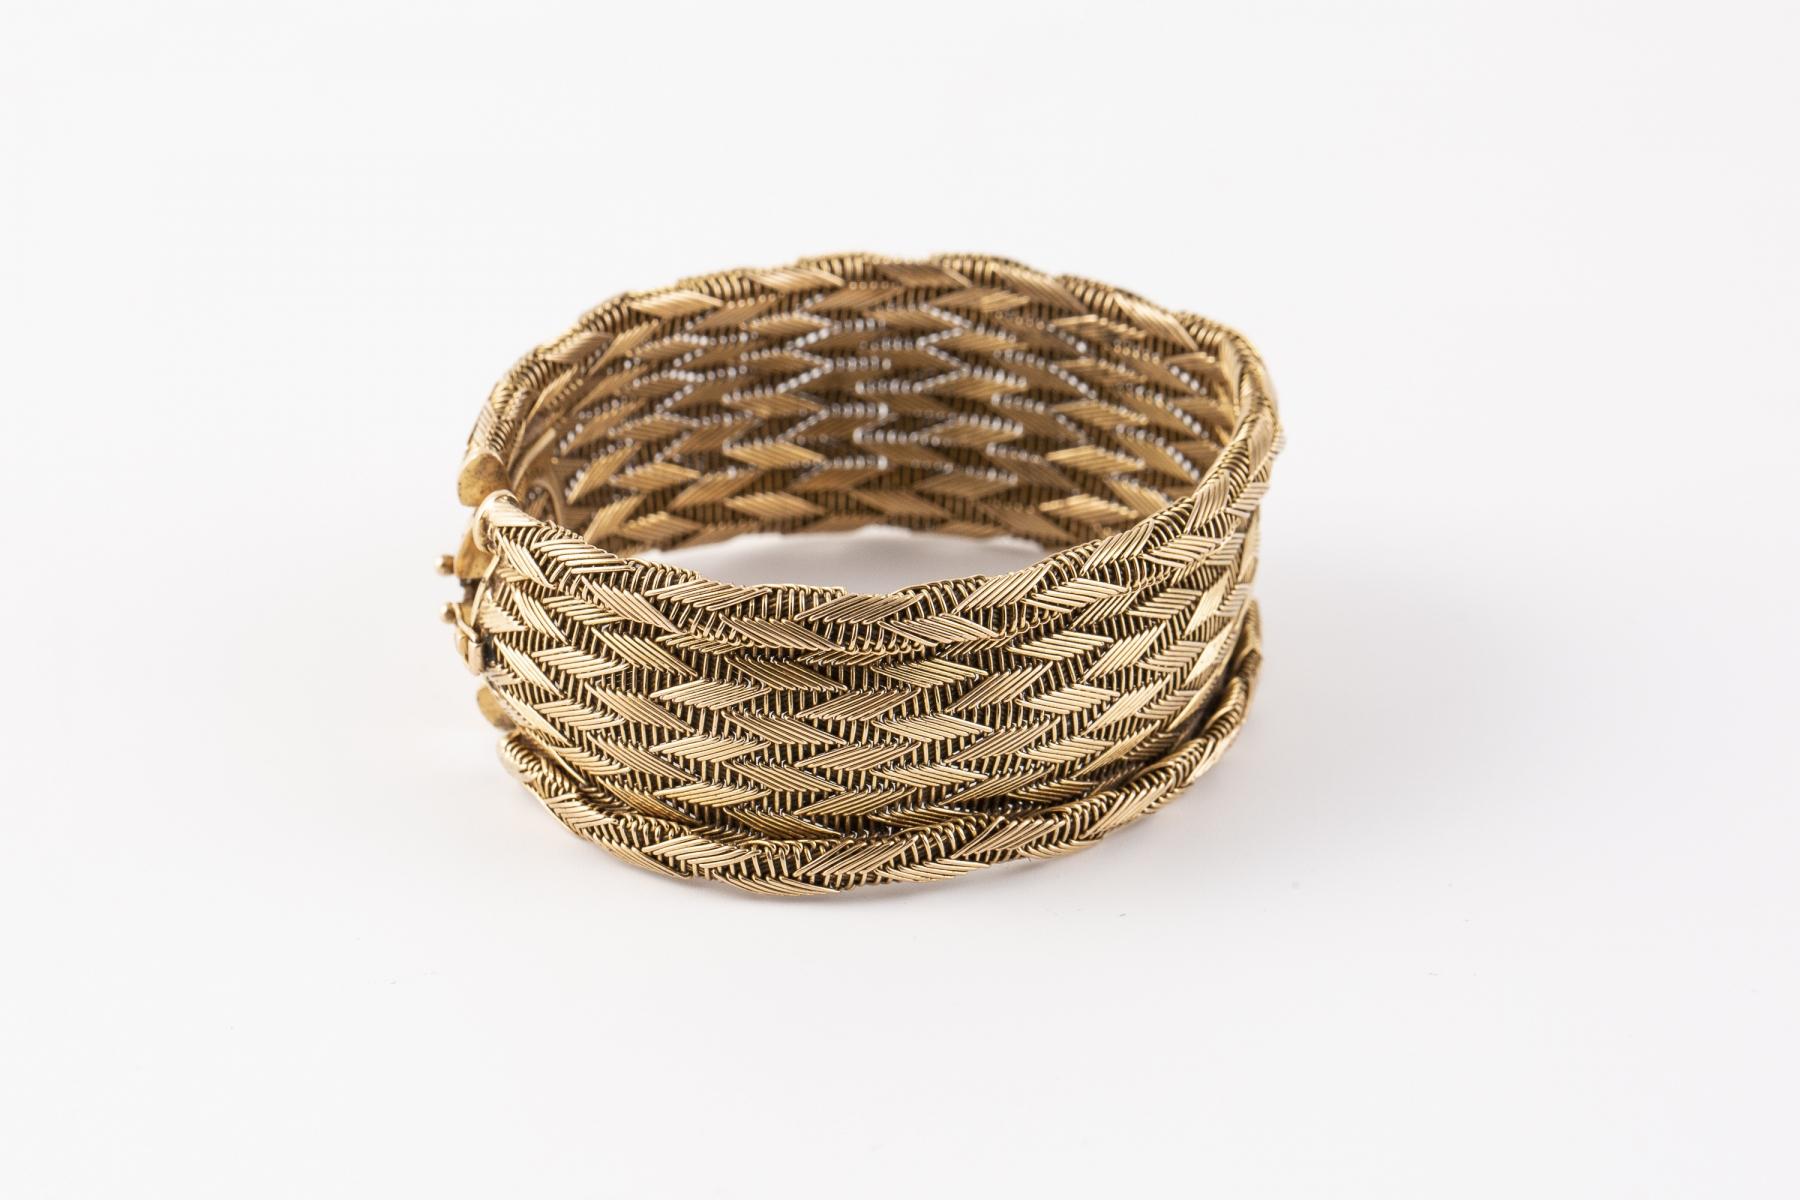 208- Bracelet manchette semi rigide en or jaune. Adjugé 1350